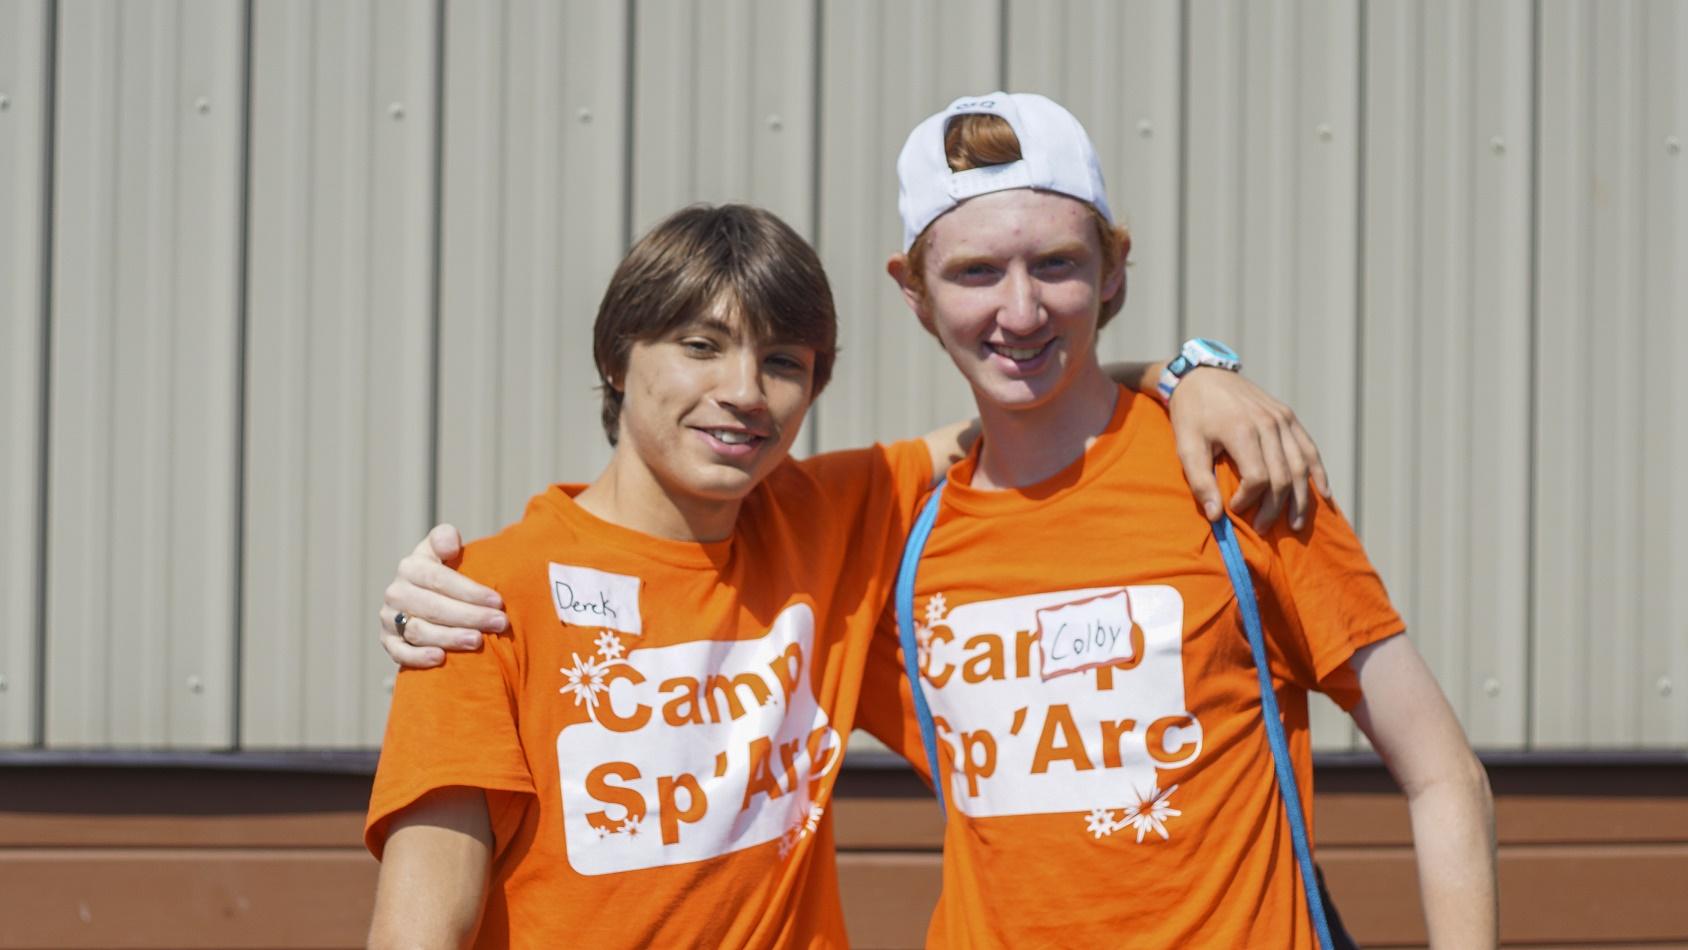 Camp Sp'Arc: Animals & Environment Week